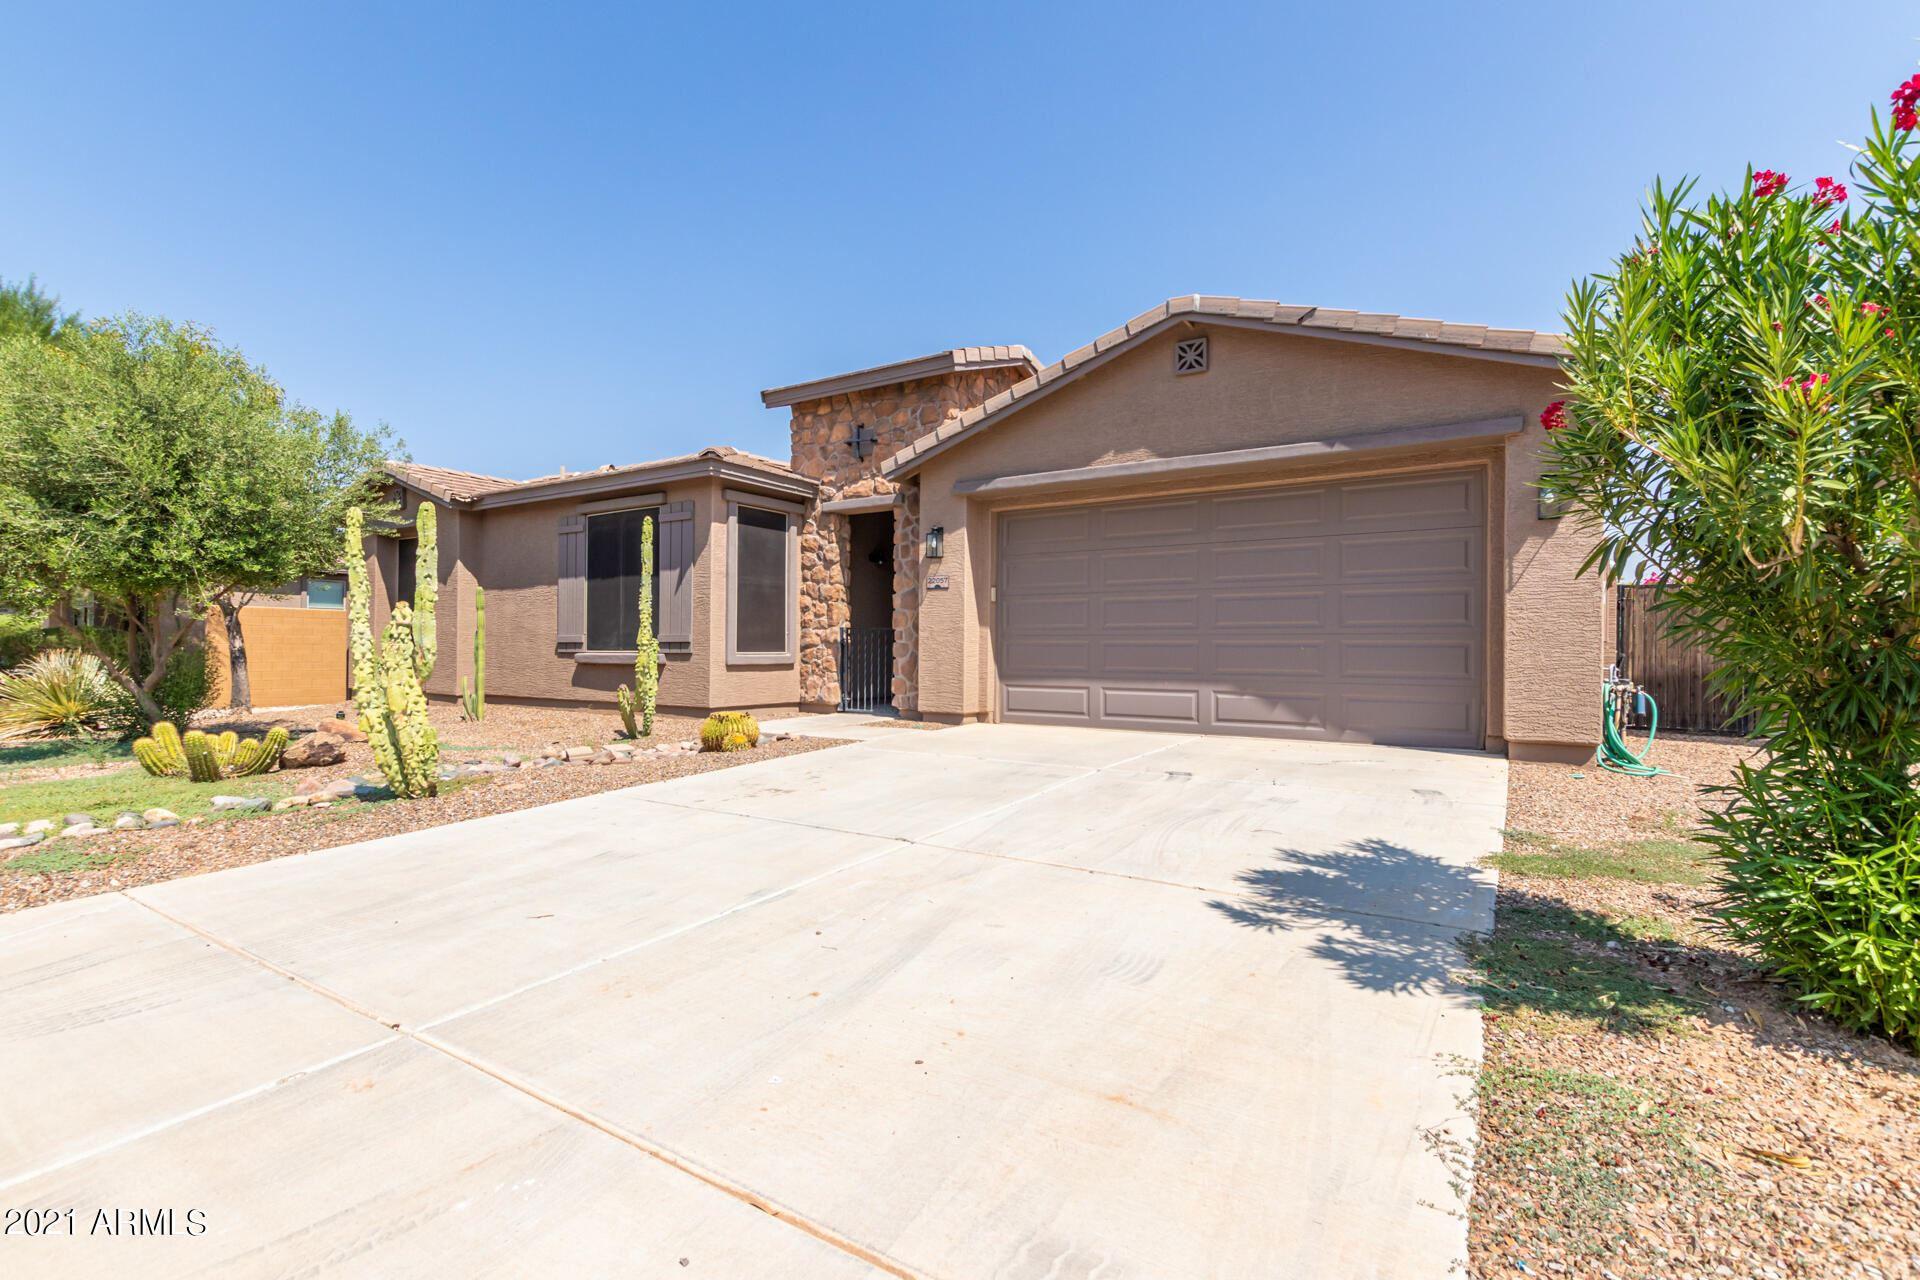 Photo of 22057 N DIAMOND Drive, Maricopa, AZ 85138 (MLS # 6294159)